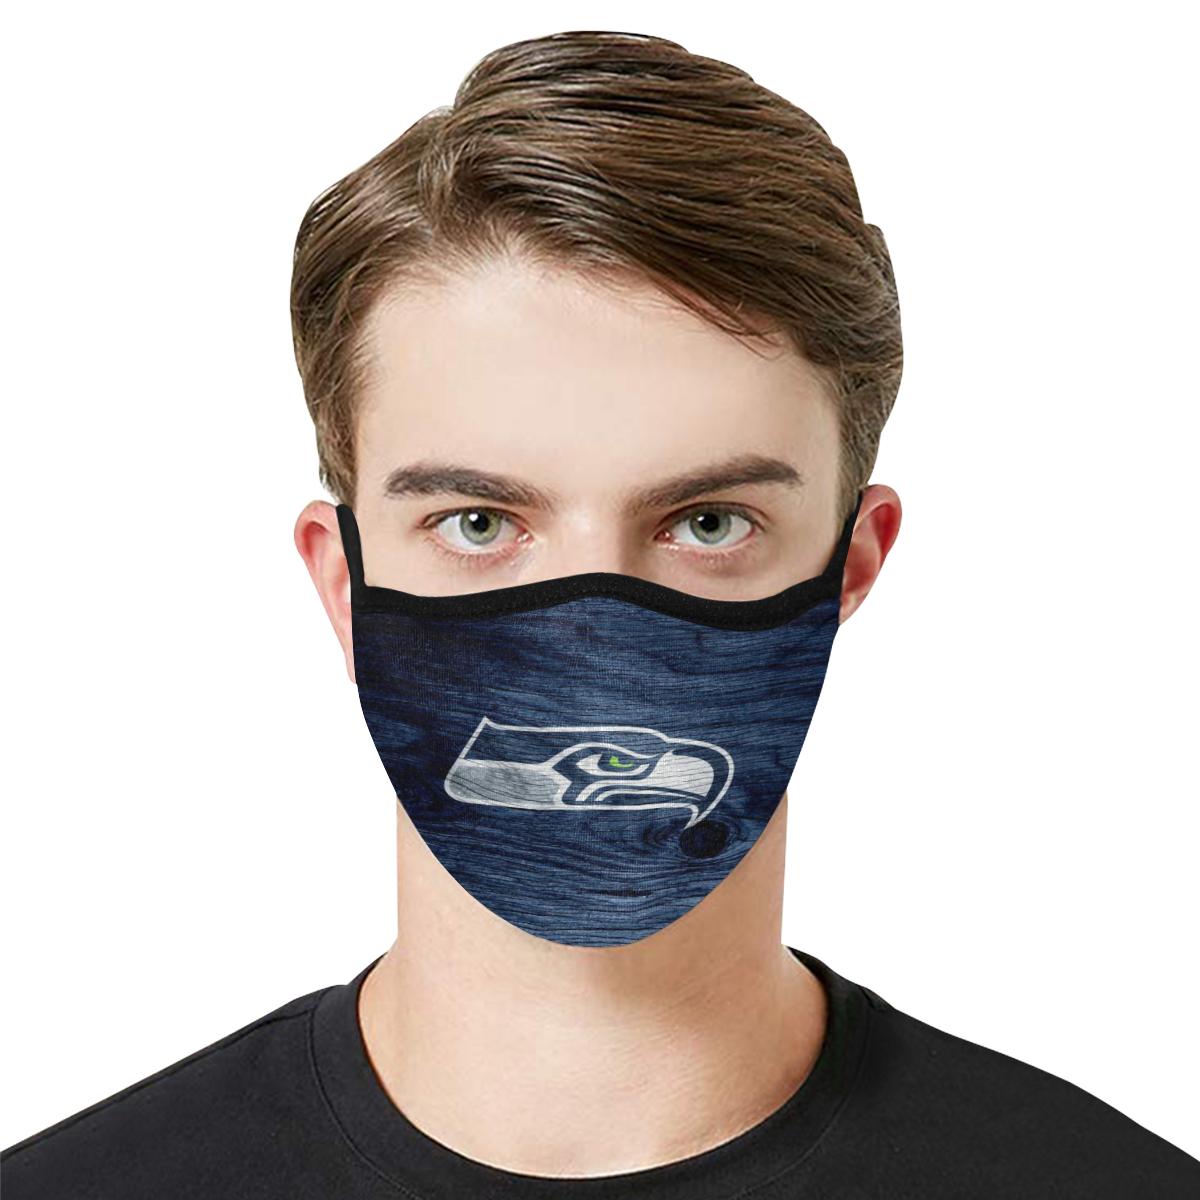 National football league seattle seahawks team cotton face mask 2